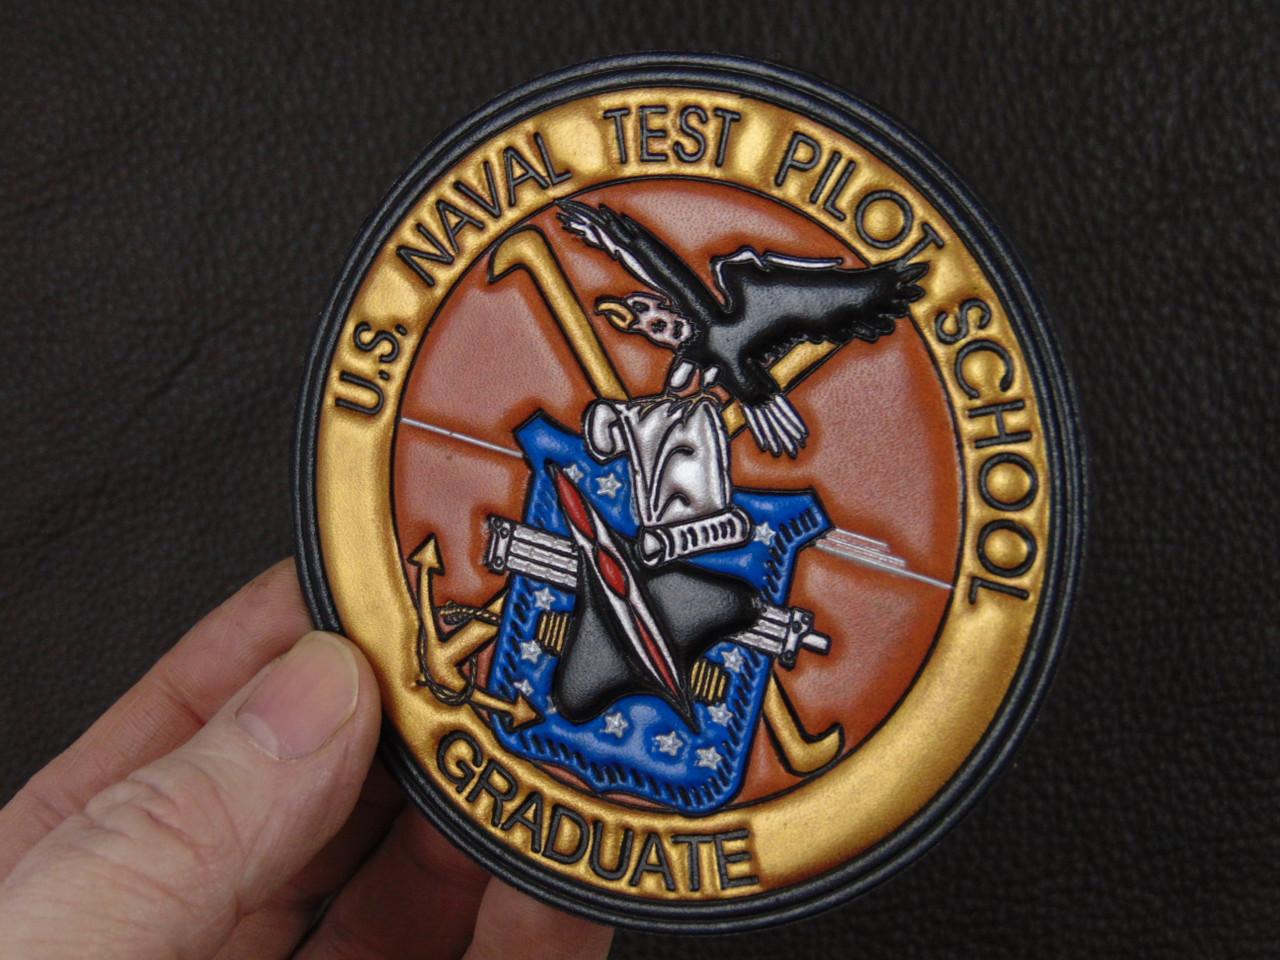 US NAVAL TEST PILOT GRAD   USNTPS  Gold Banner